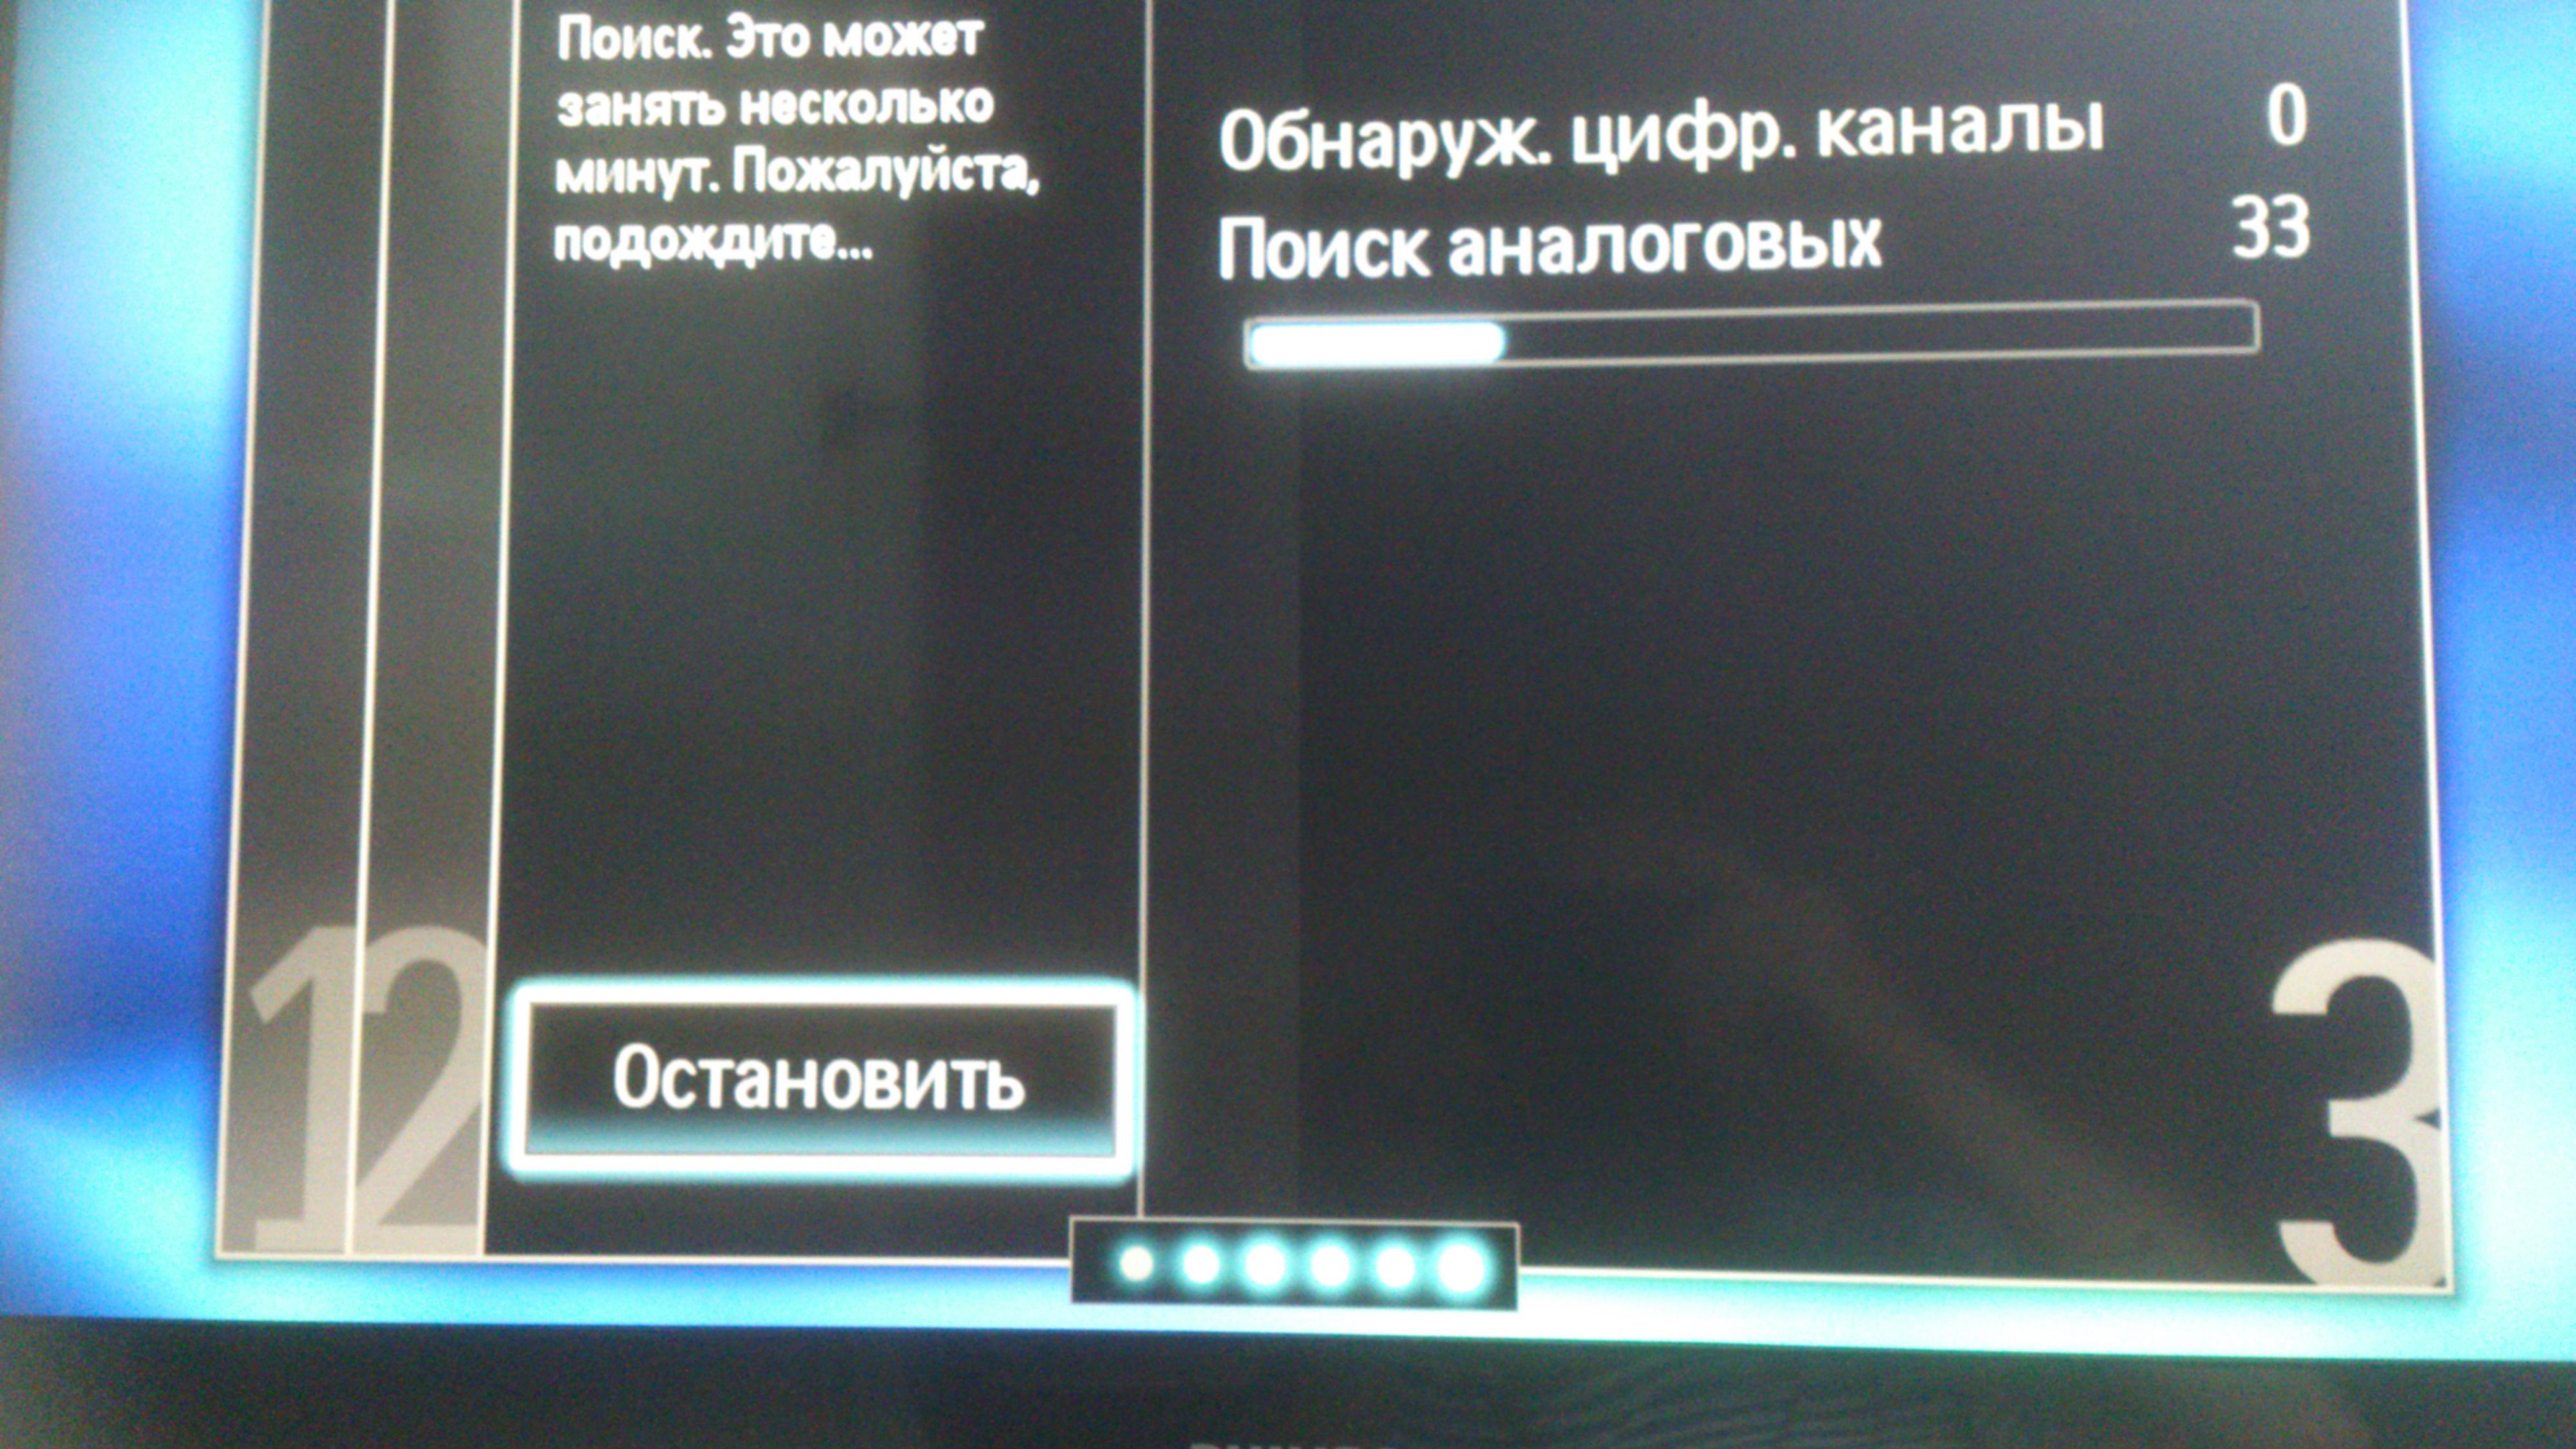 Экран меняет цвета при включении